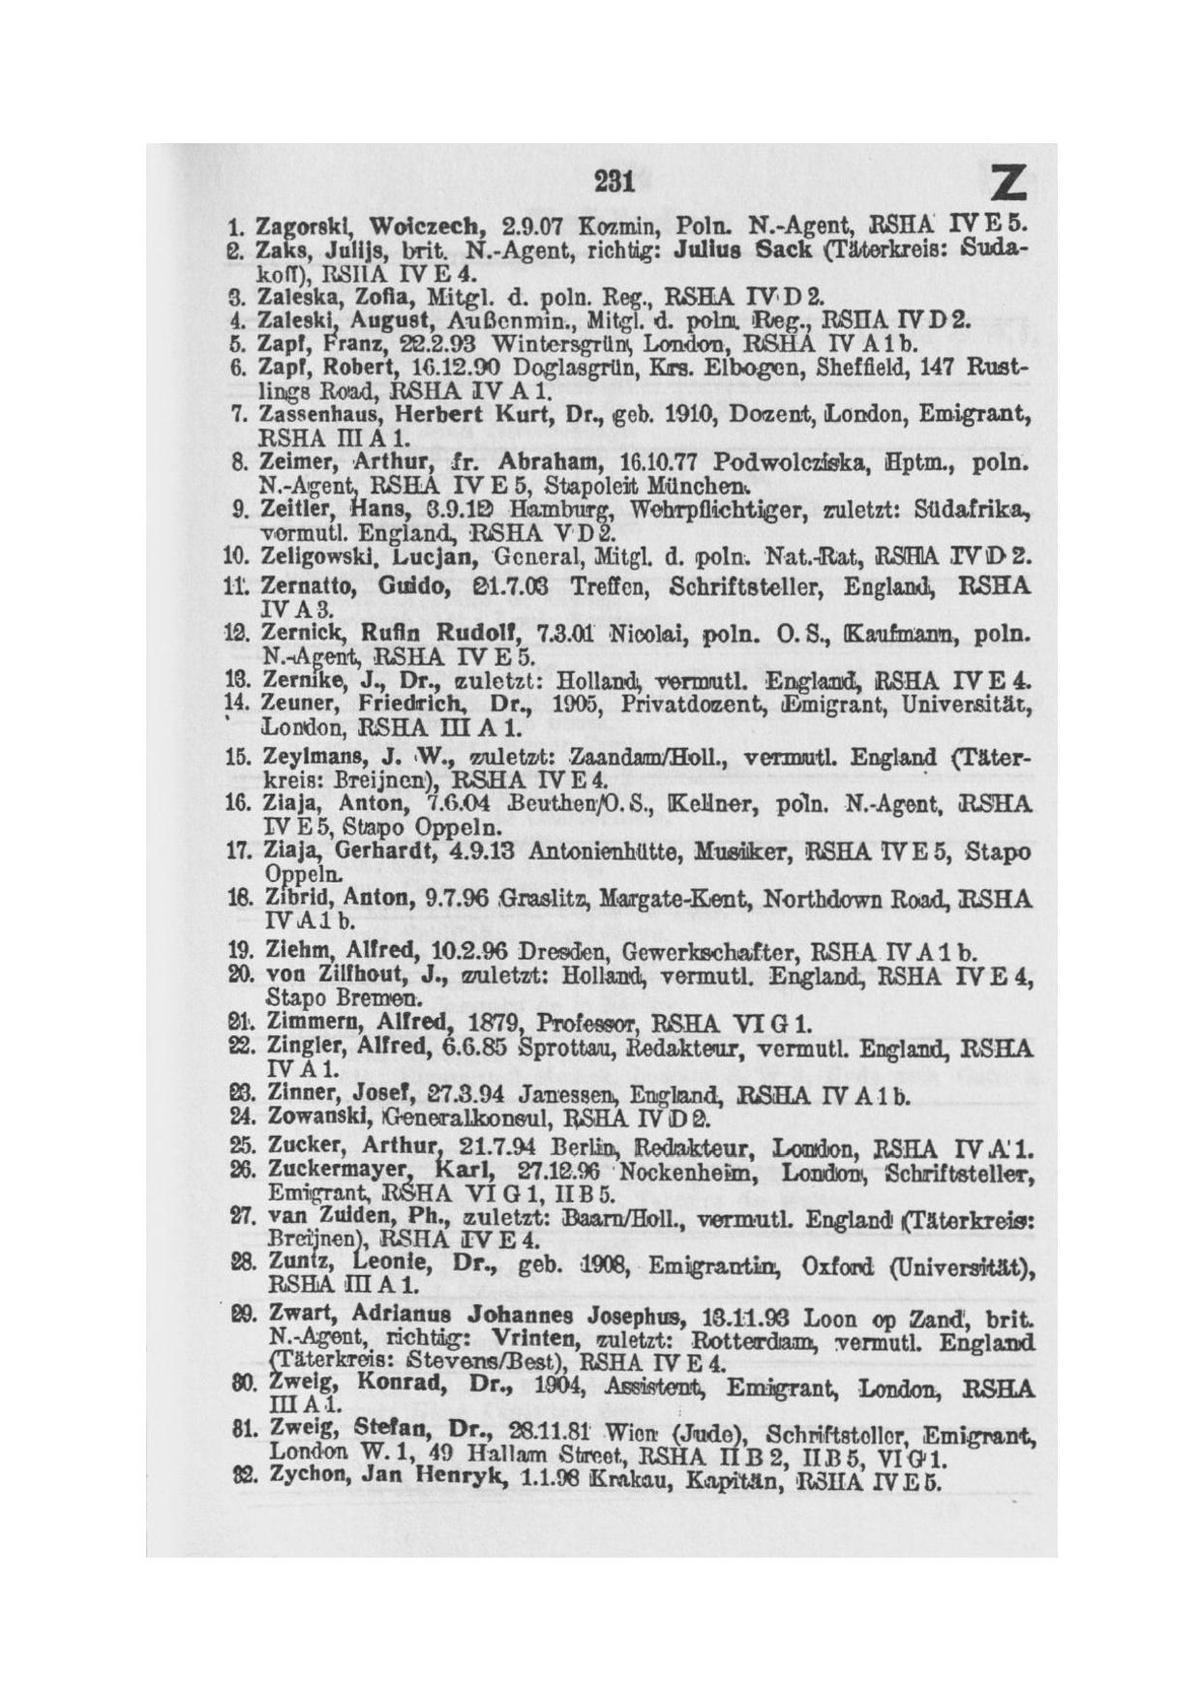 Ellis Island Documents Secondes